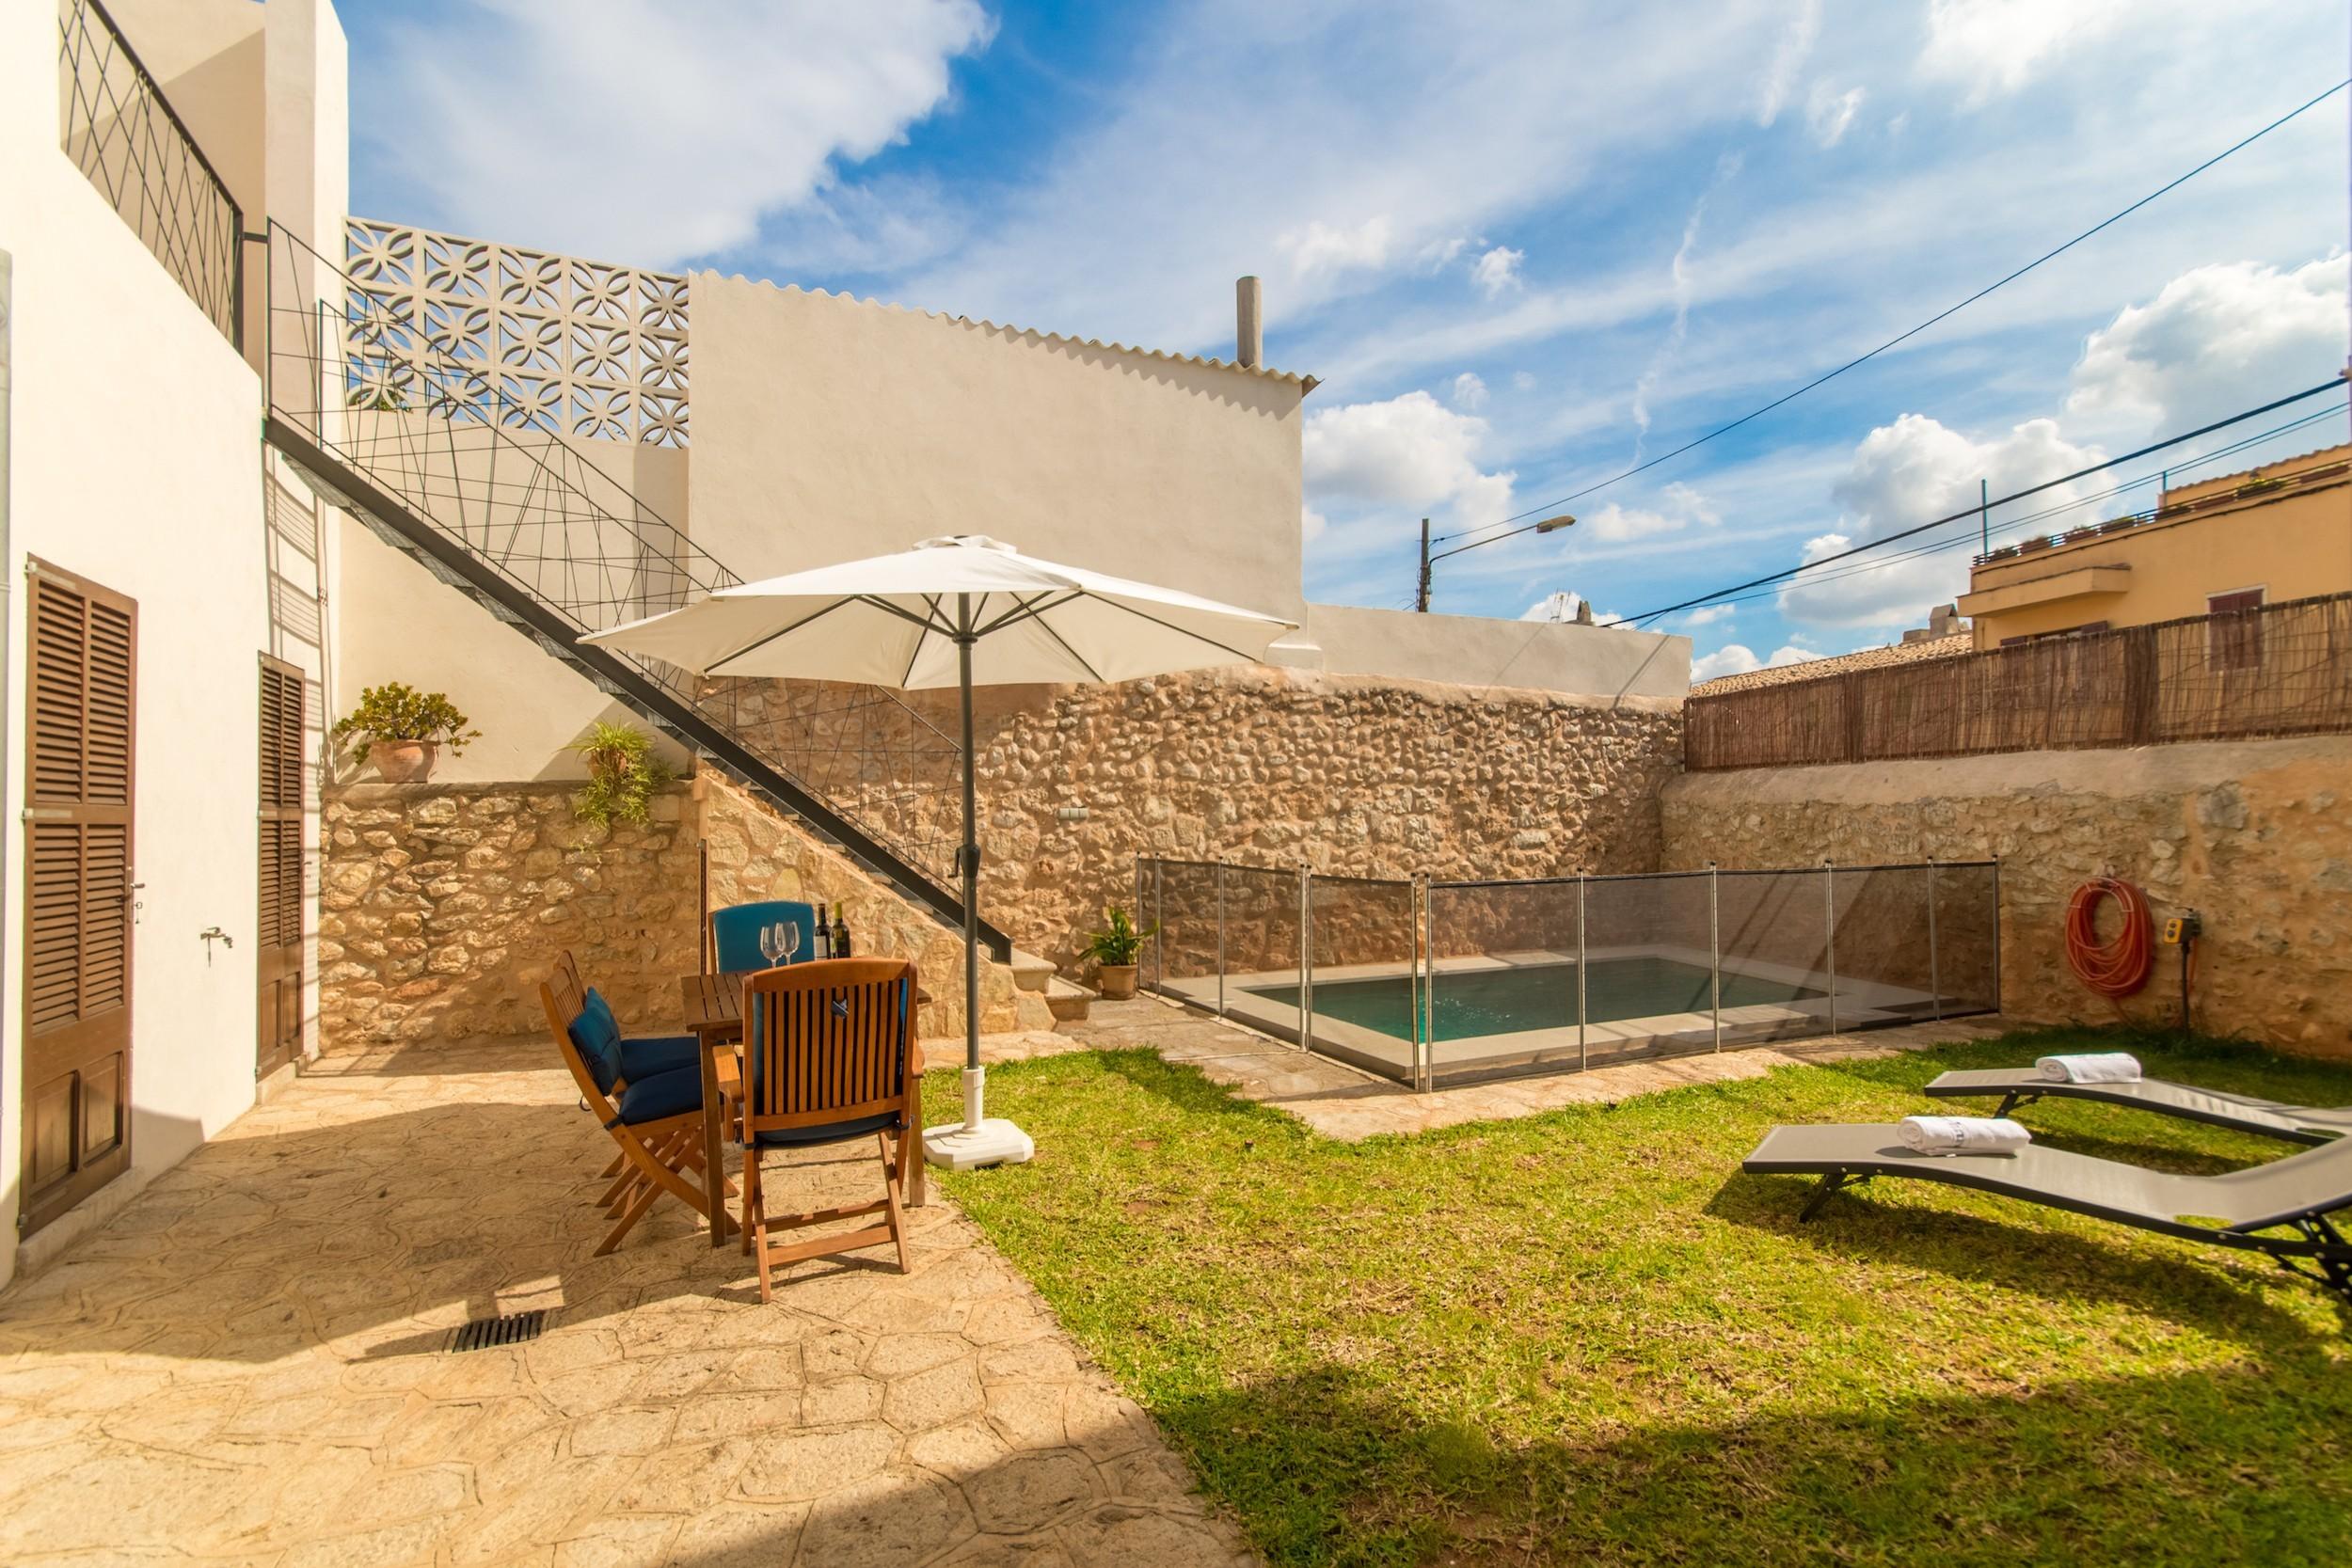 3 DBR, 2 BR, 1 shower bathroom outside, AC, free wifi, fenced pool, barbecue and sun terrace.